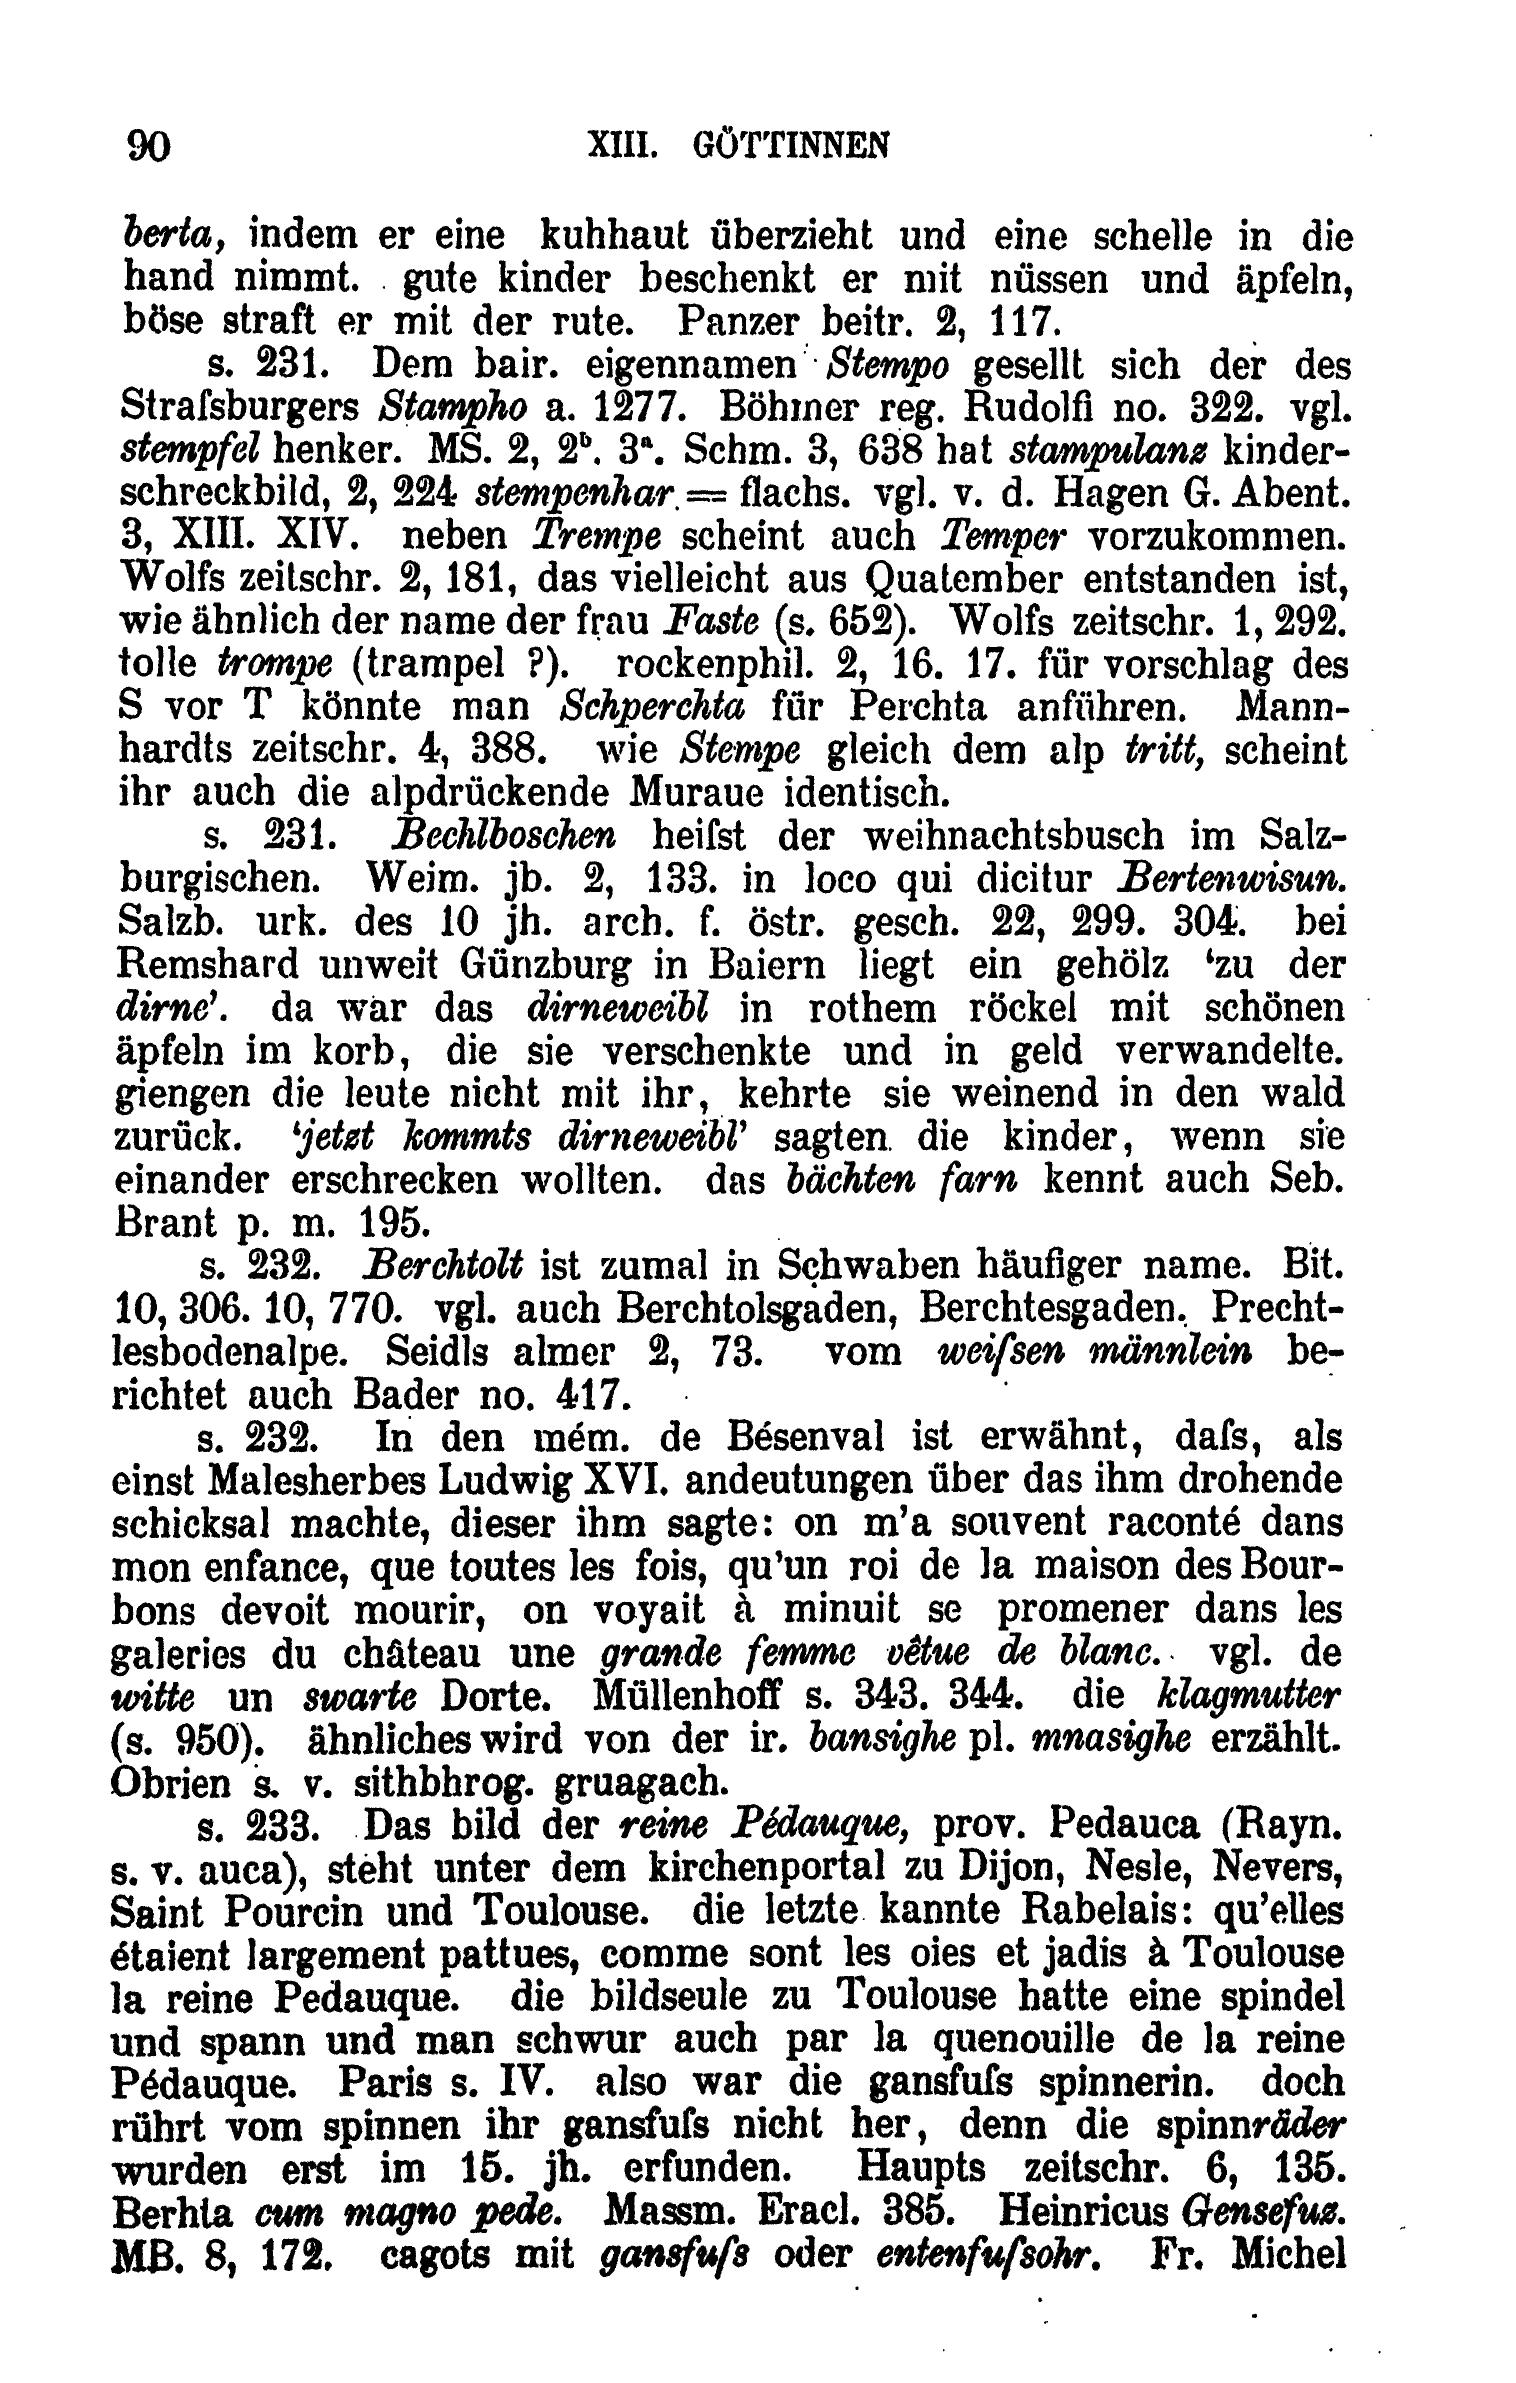 File:Deutsche Mythologie (Grimm) V3 104.jpg - Wikimedia Commons